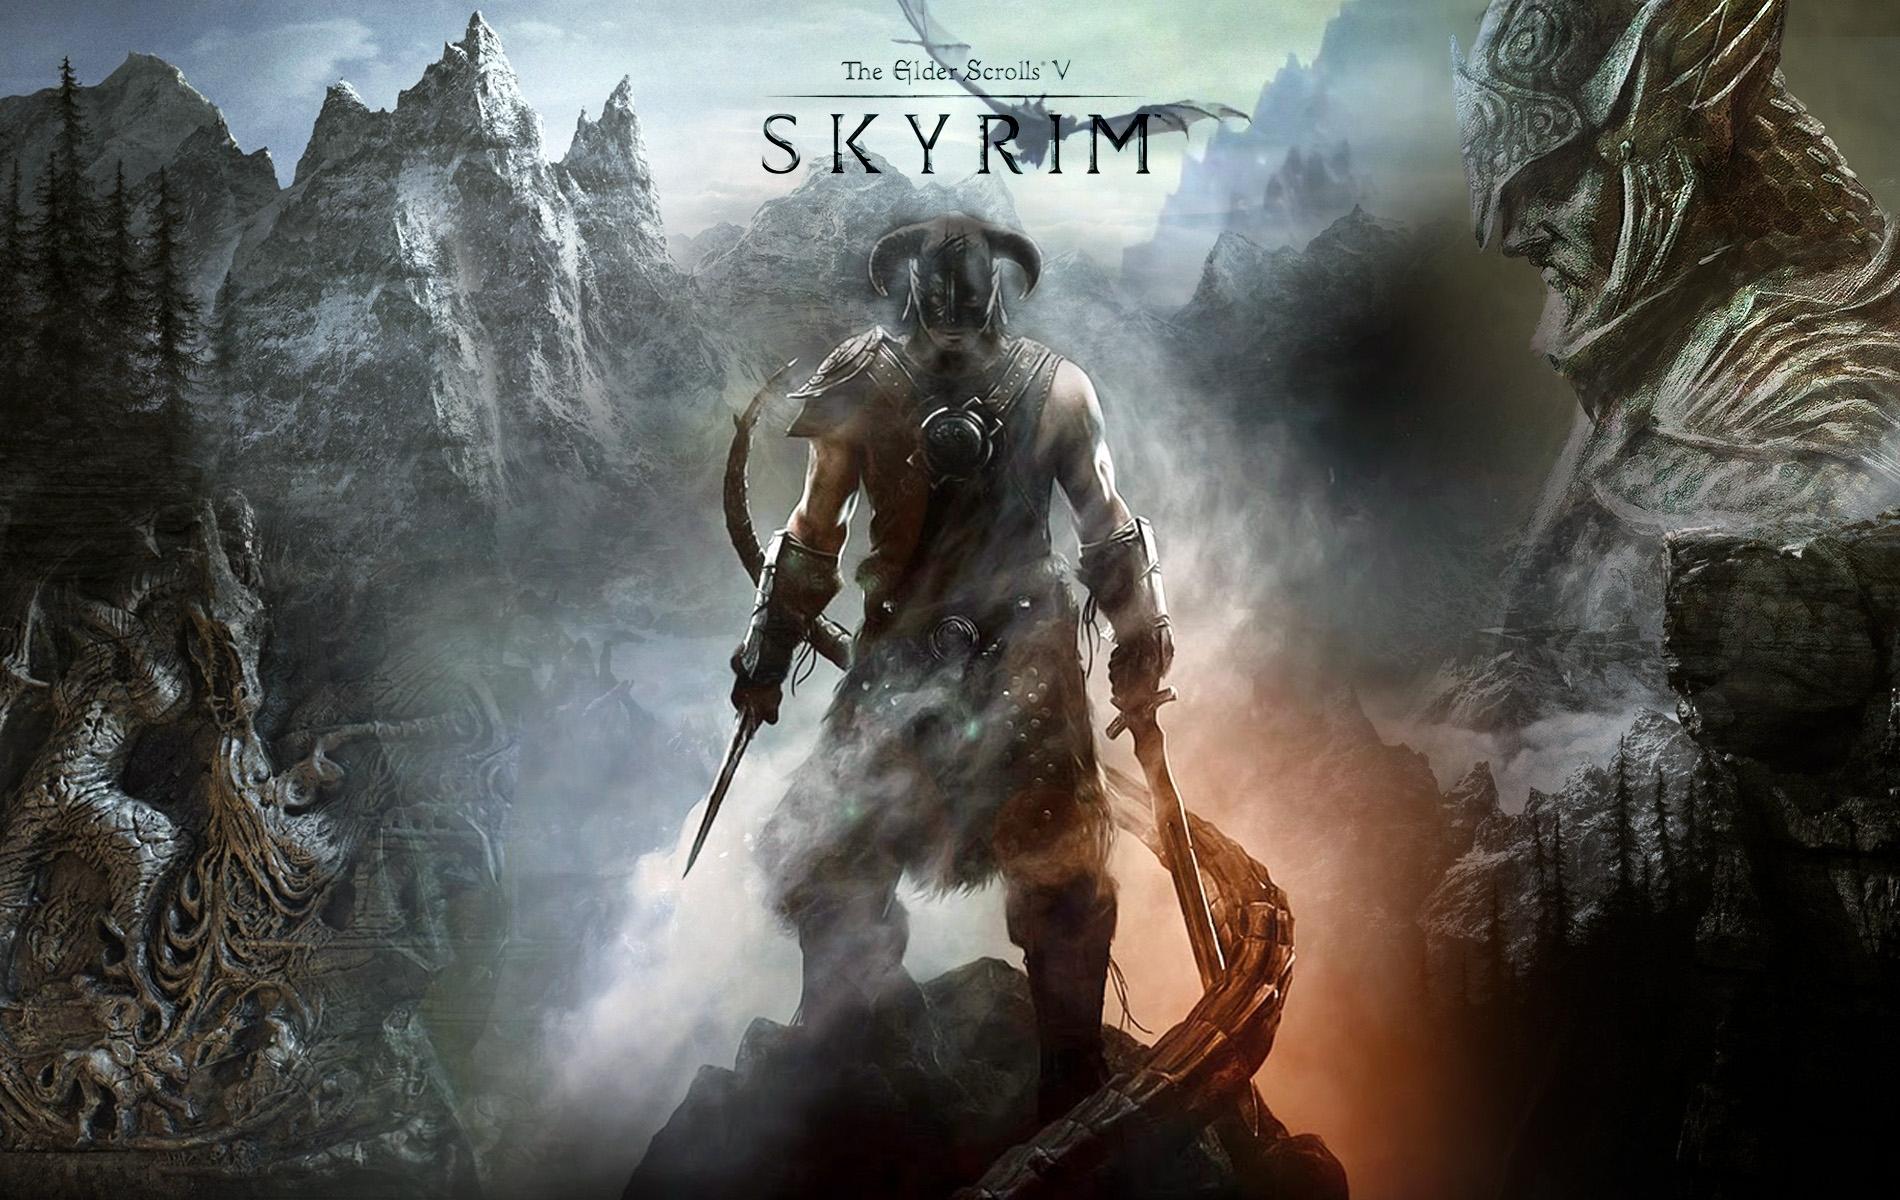 video game the elder scrolls v: skyrim wallpapers (desktop, phone